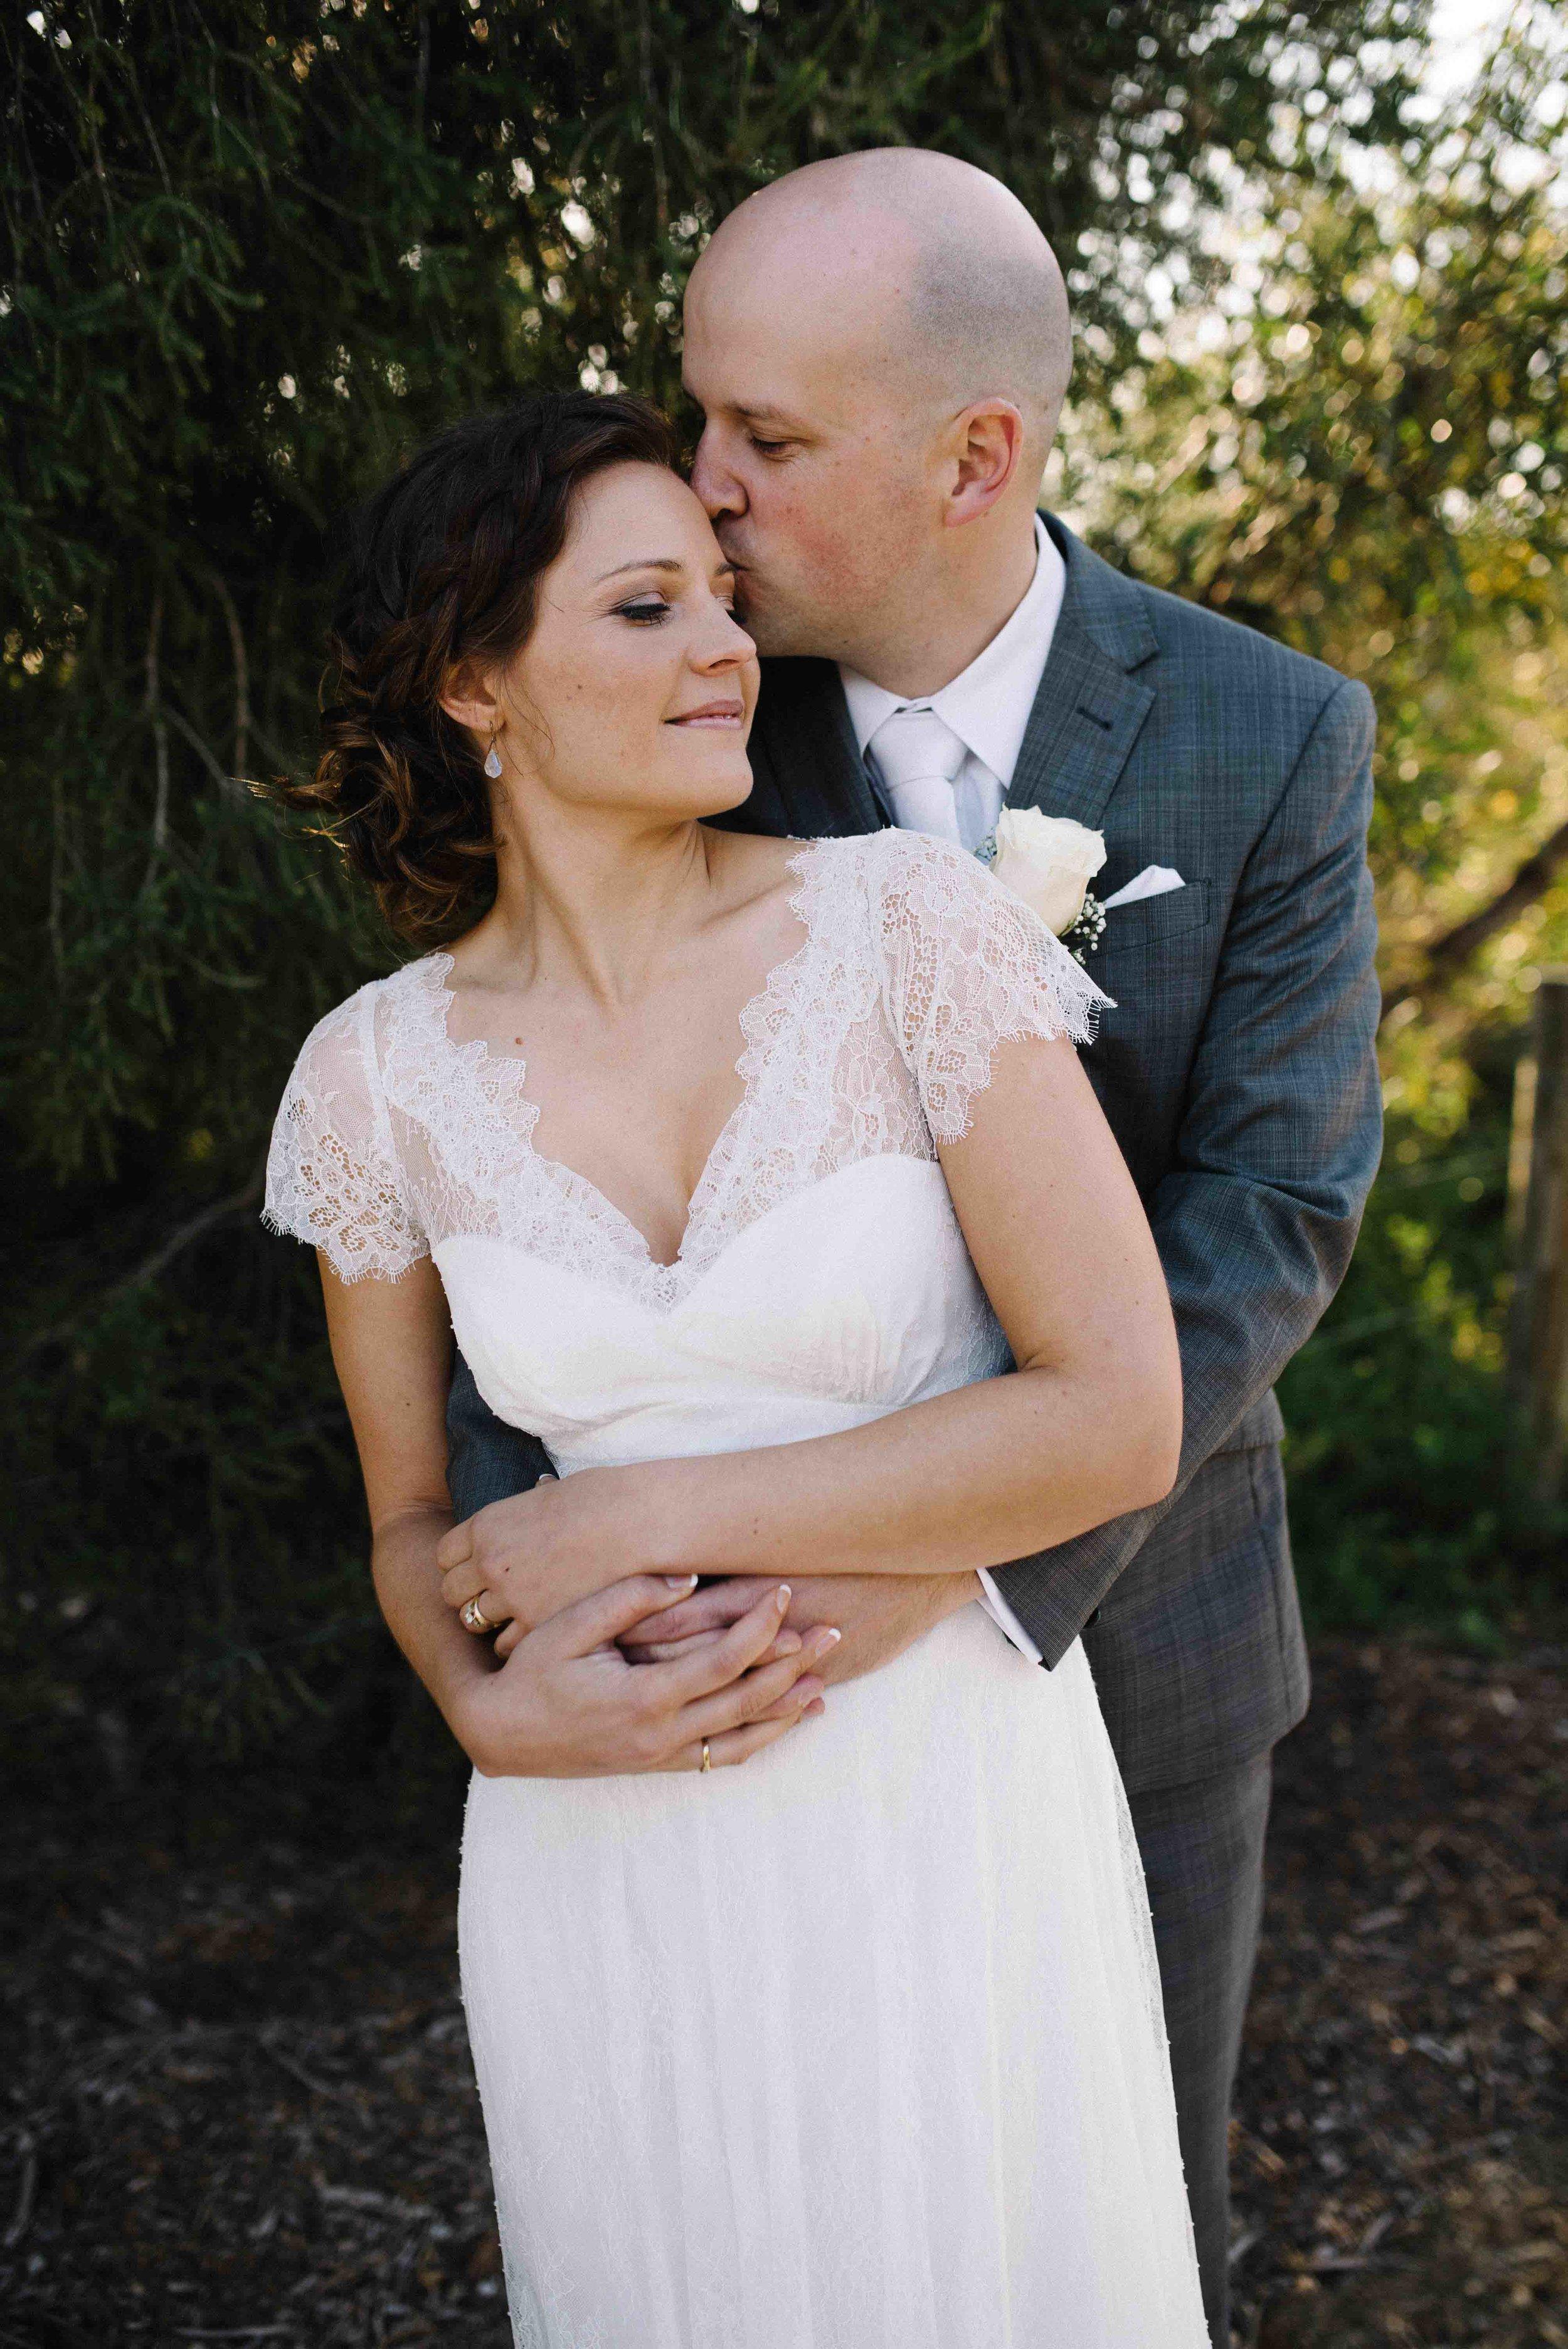 57-romantic wedding photography perth fremantle.jpg